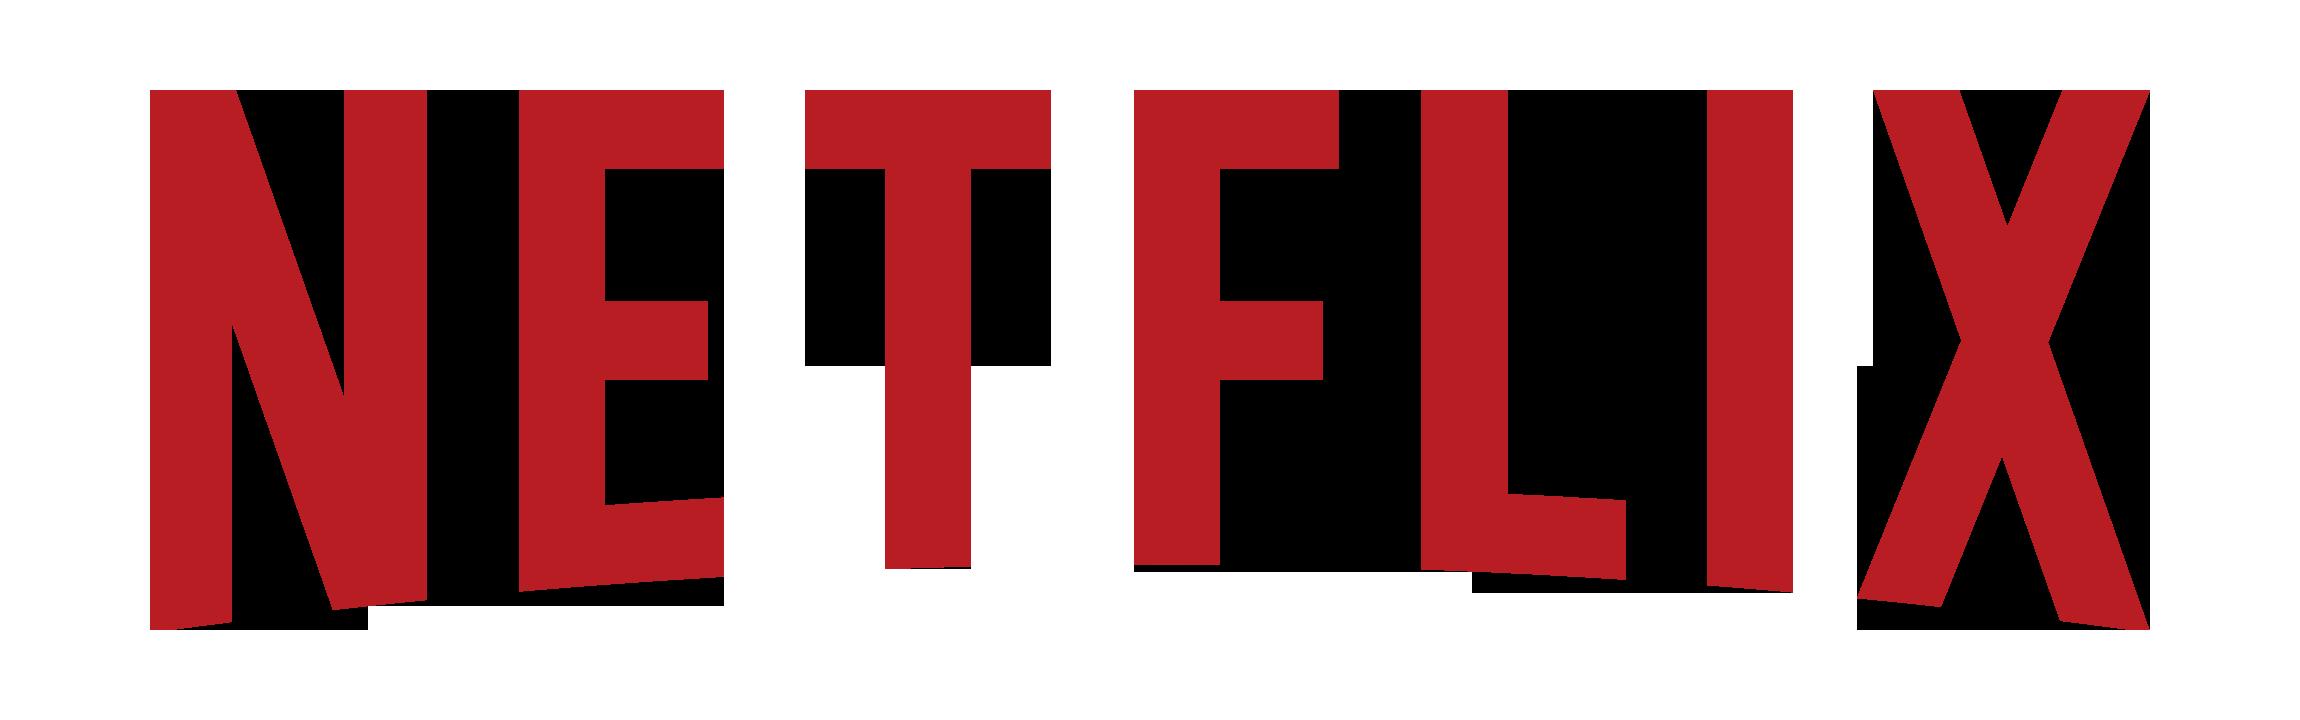 Télephone information entreprise  Netflix